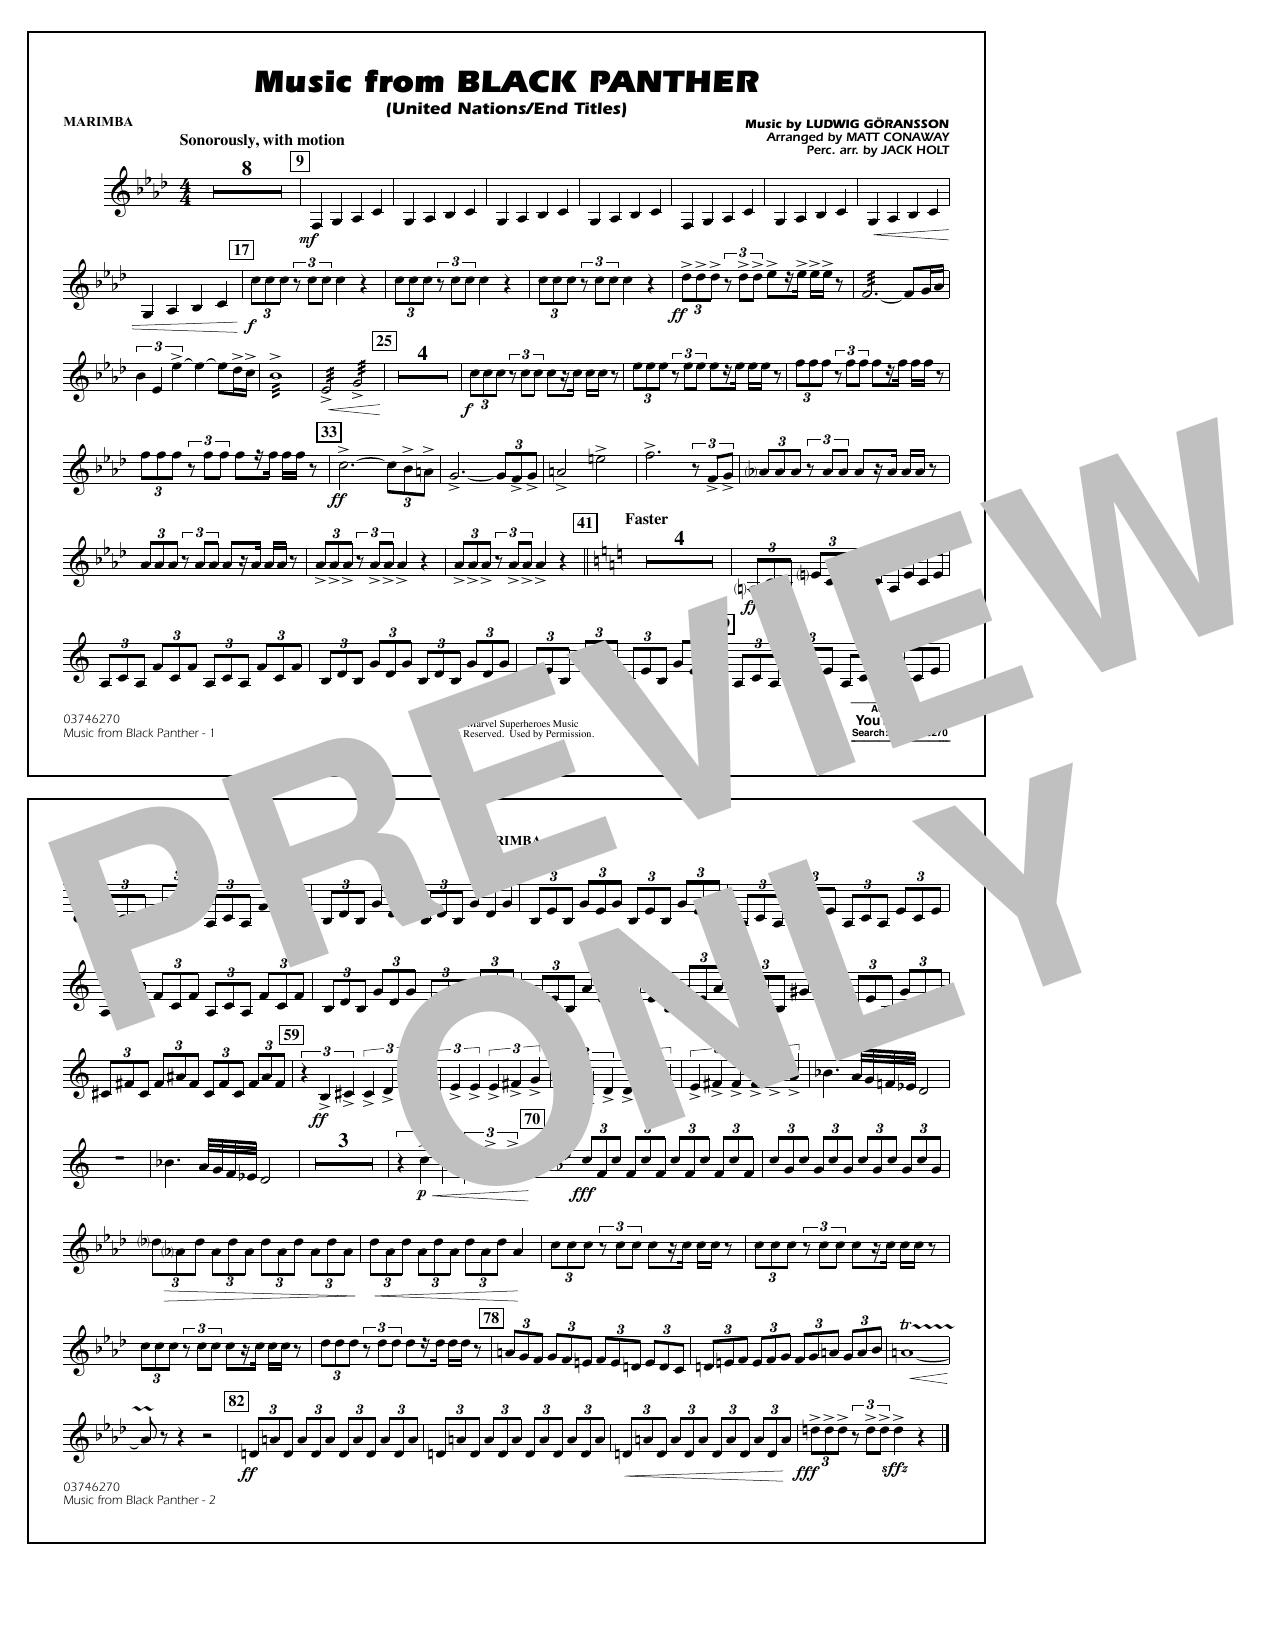 Music from Black Panther (arr. Matt Conaway) - Marimba (Marching Band)